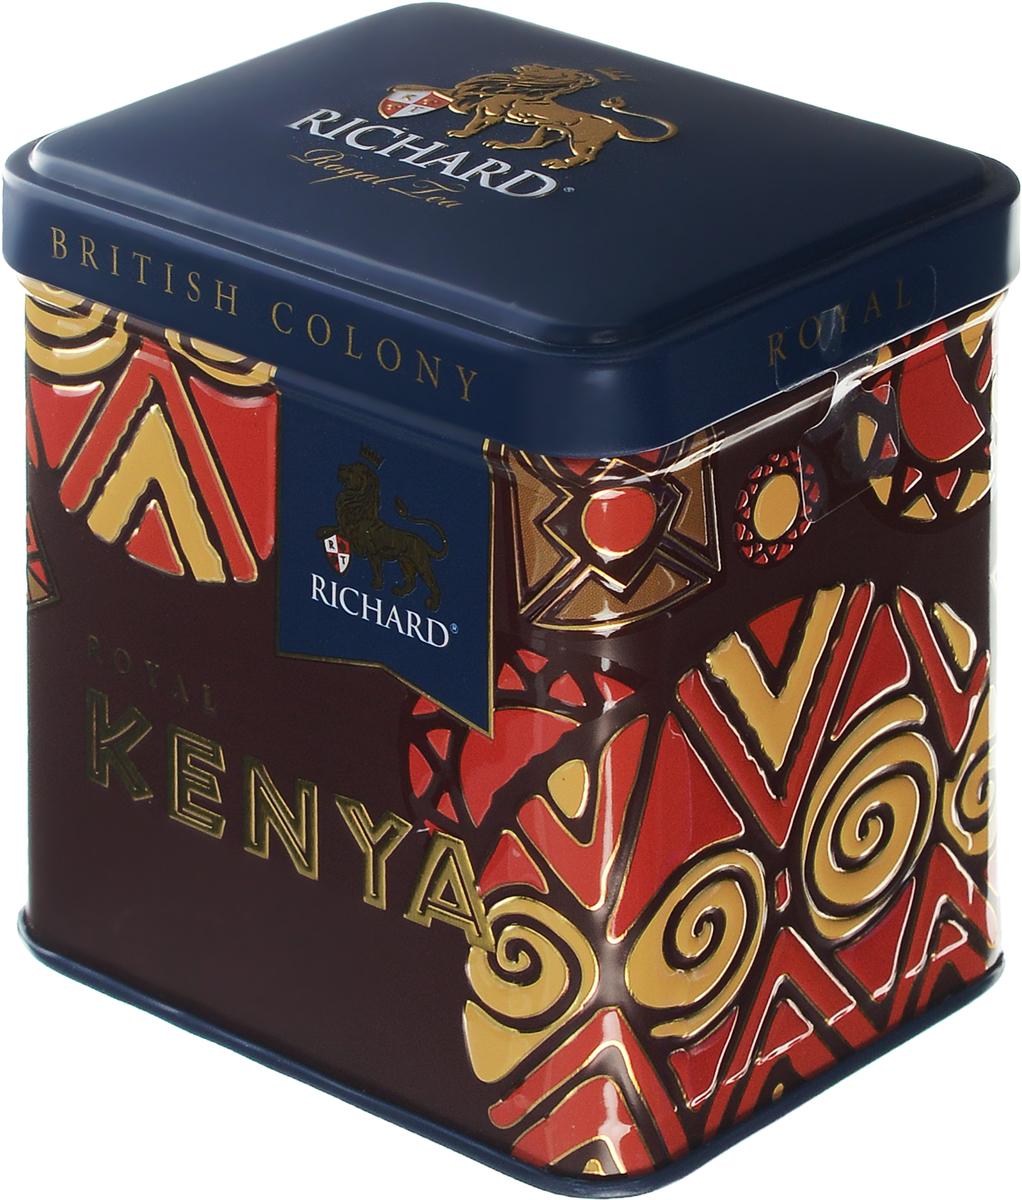 Richard British Colony Royal Kenya черный листовой чай, 50 г the jamestown colony